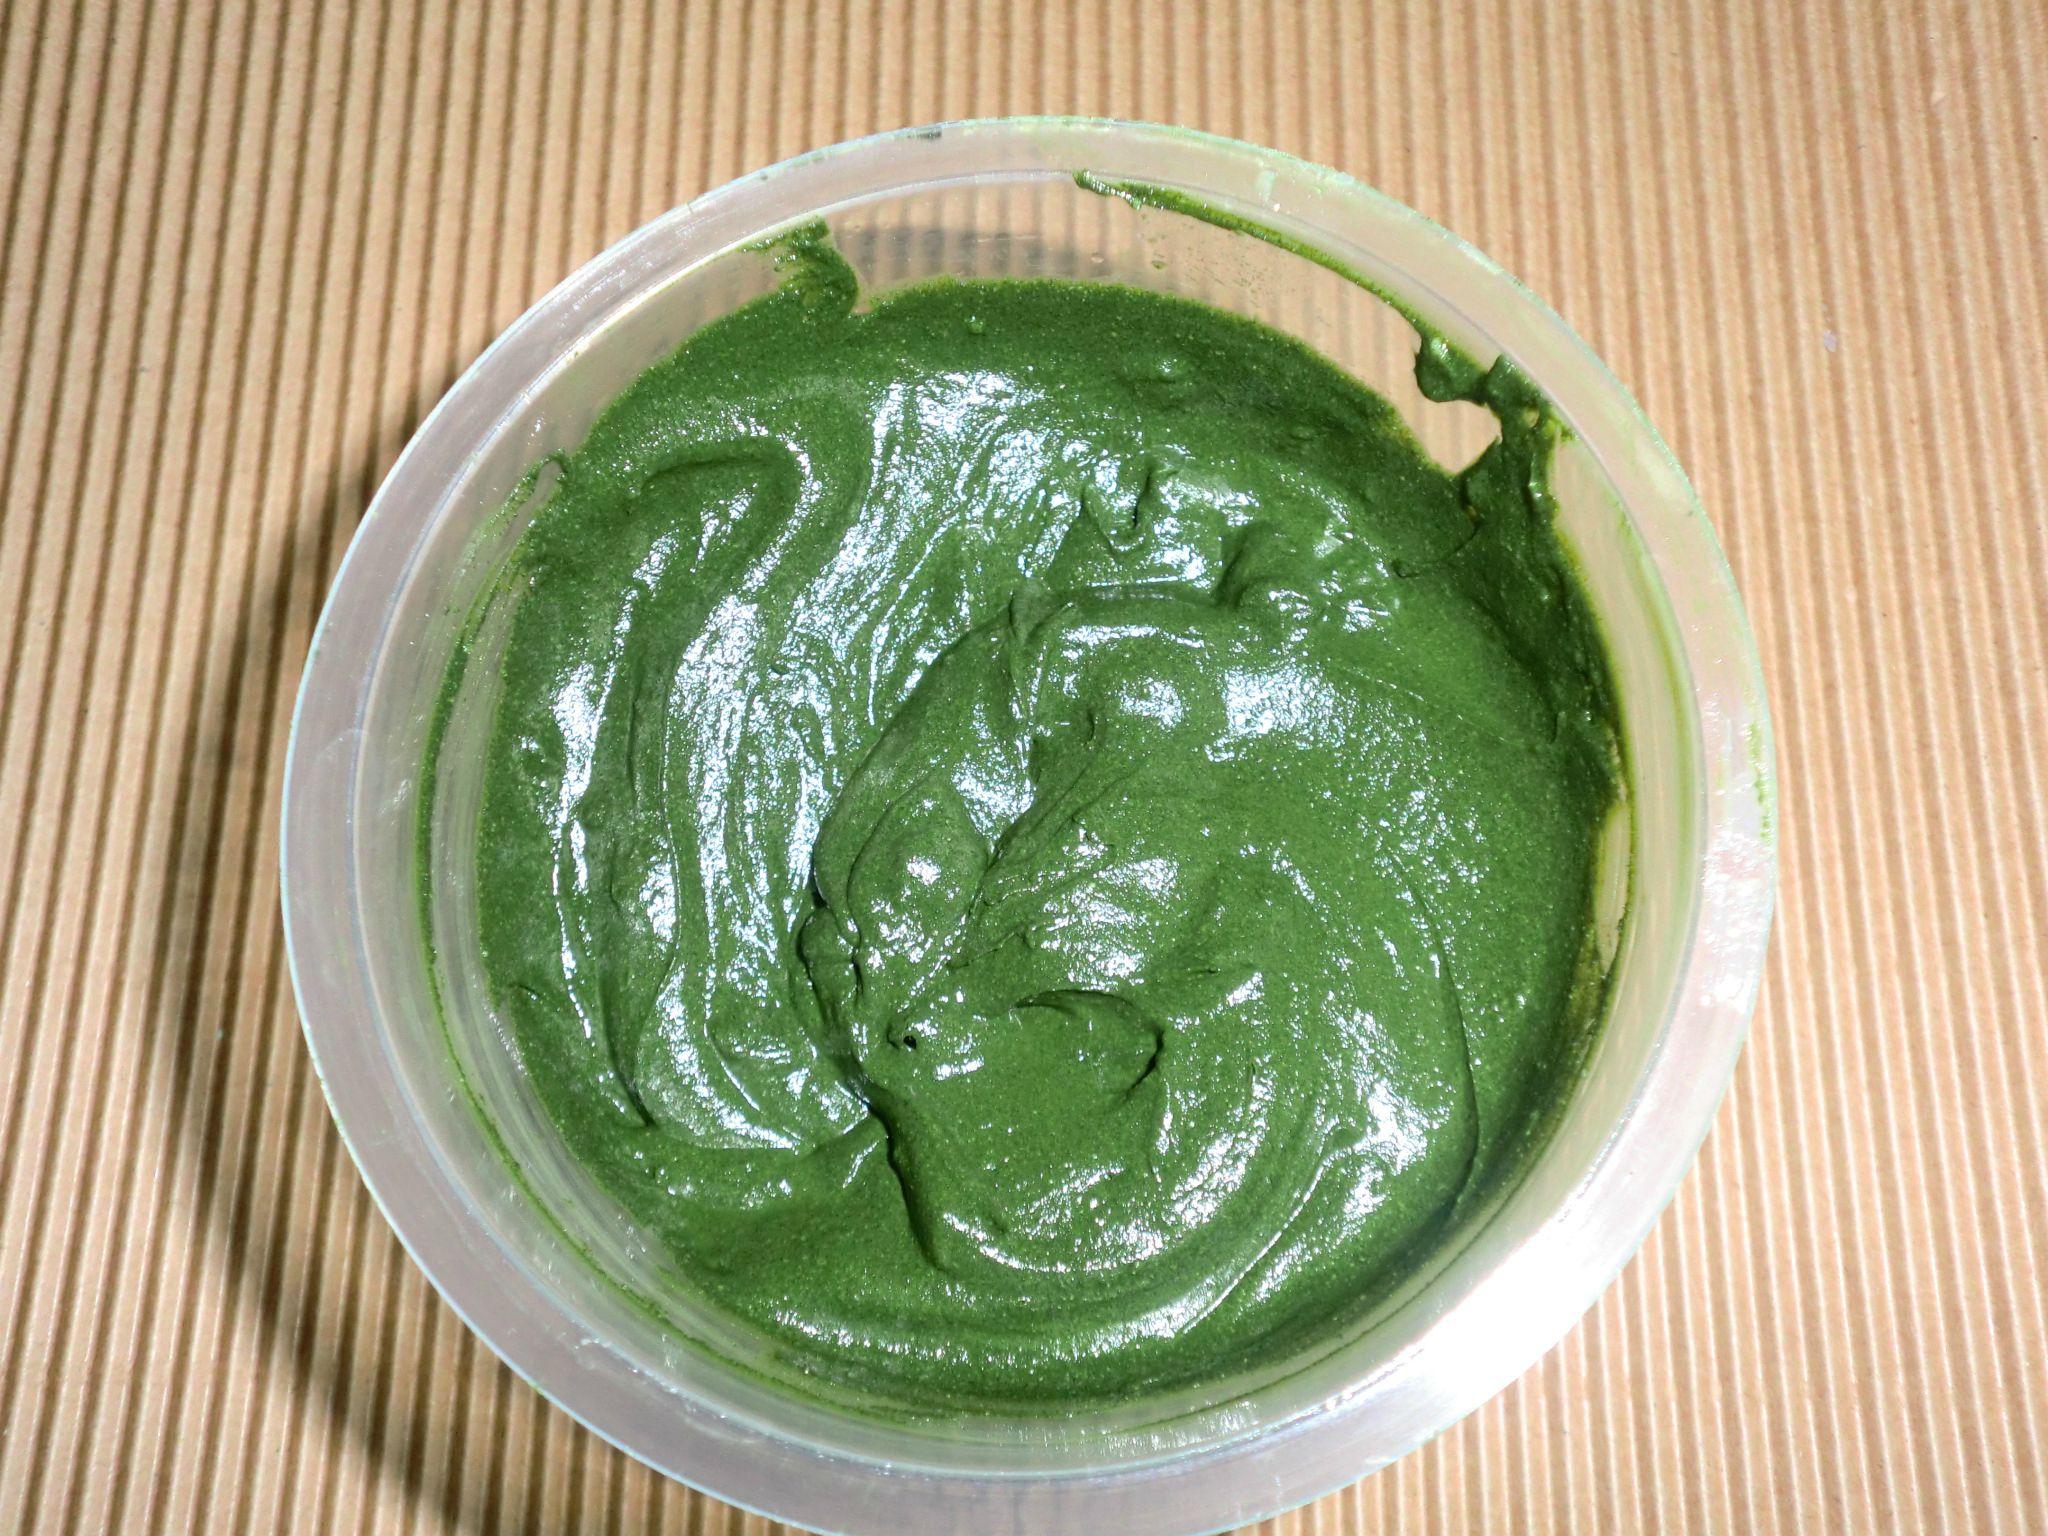 masque aux algues marines